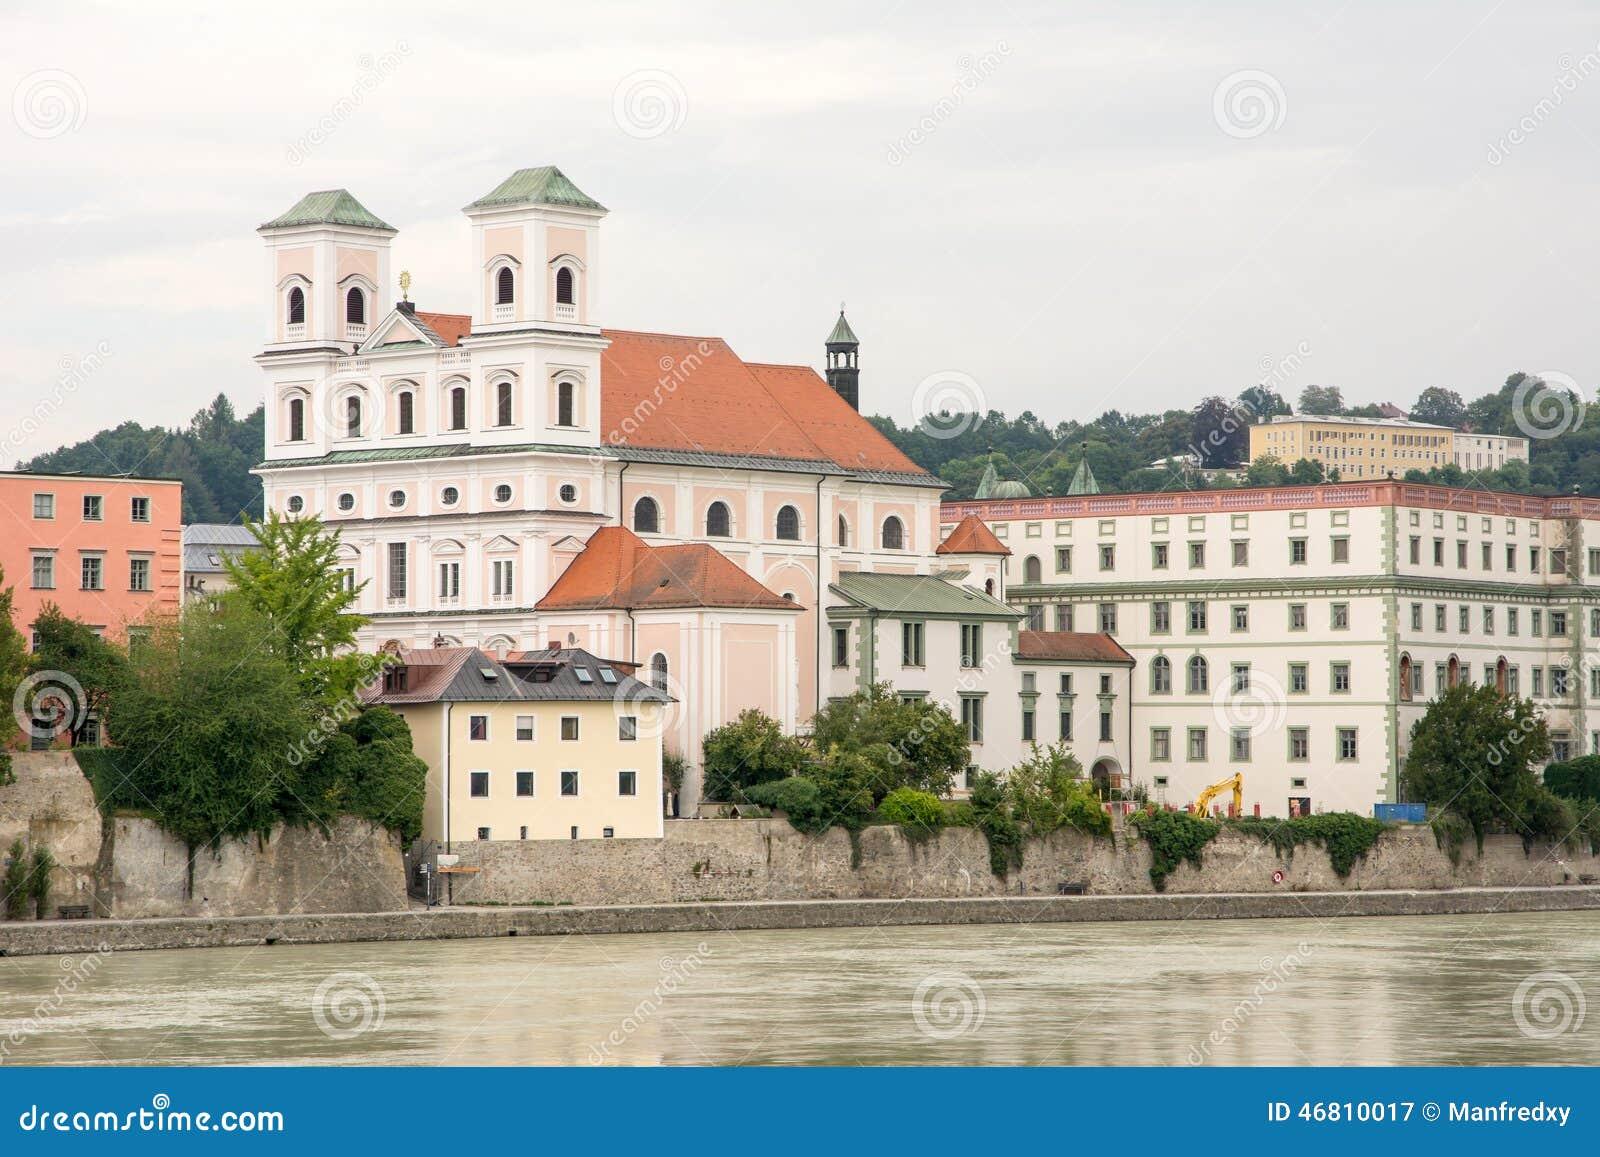 Passau Inn Promenade